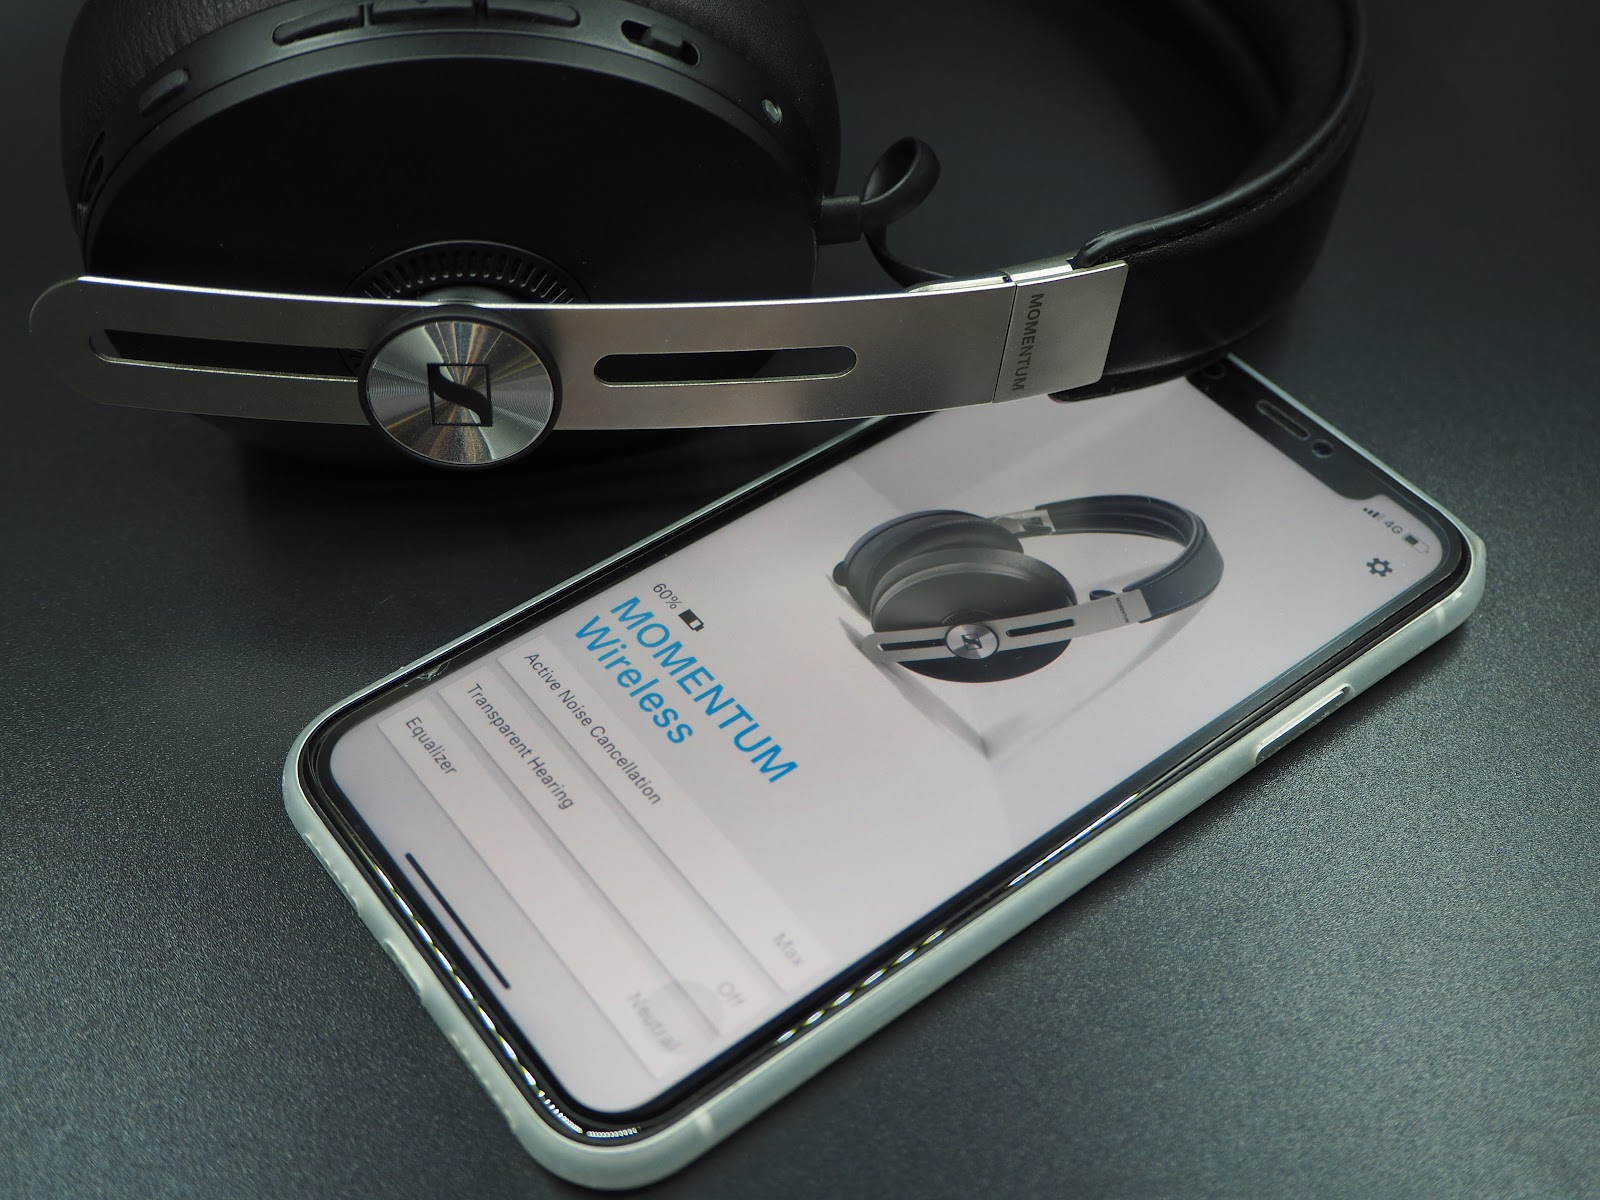 Sennheiser Smart Control smartphone application